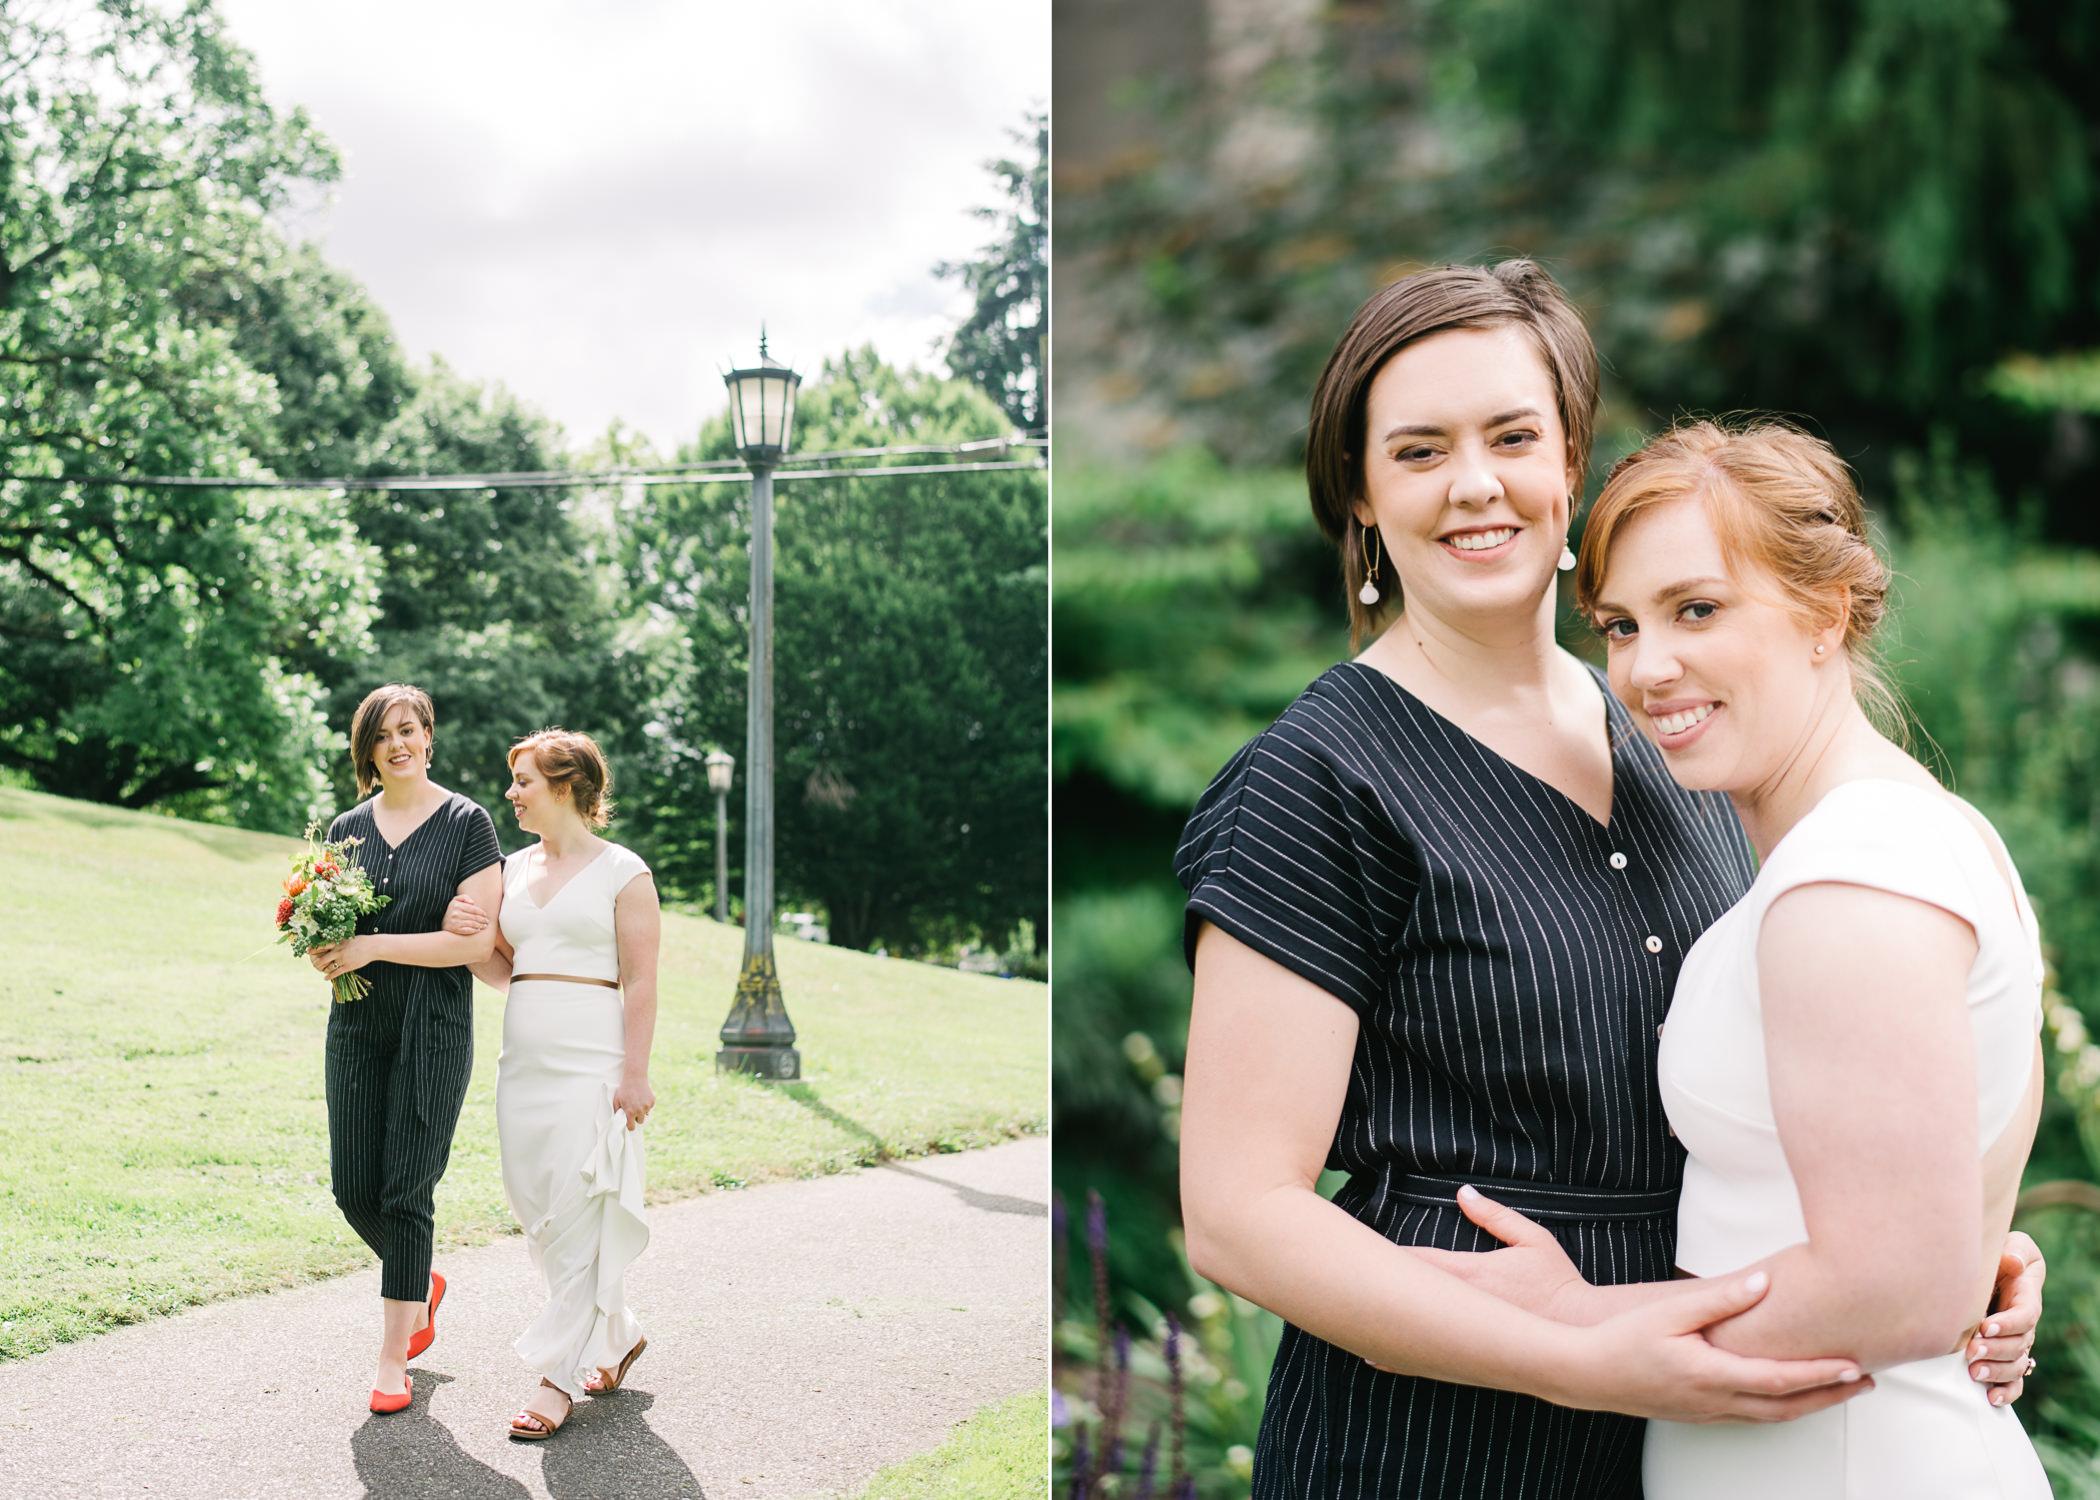 cathedral-park-portland-elopement-gay-wedding-050.JPG